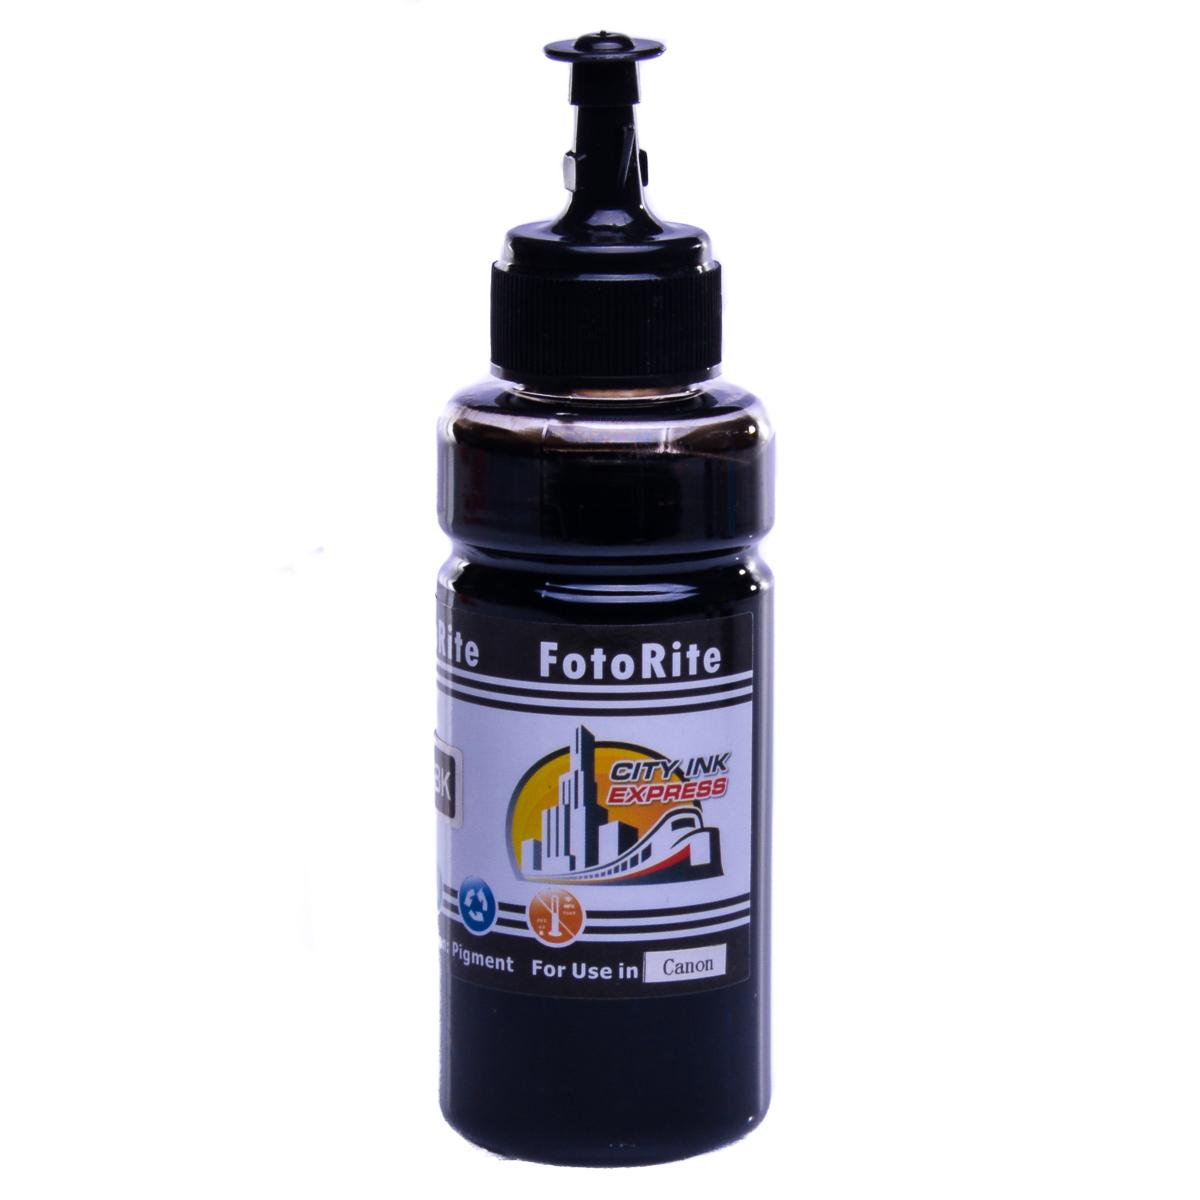 Cheap Pigment Black pigment ink replaces Canon Pixma TS9040 - PGI-570PGBK